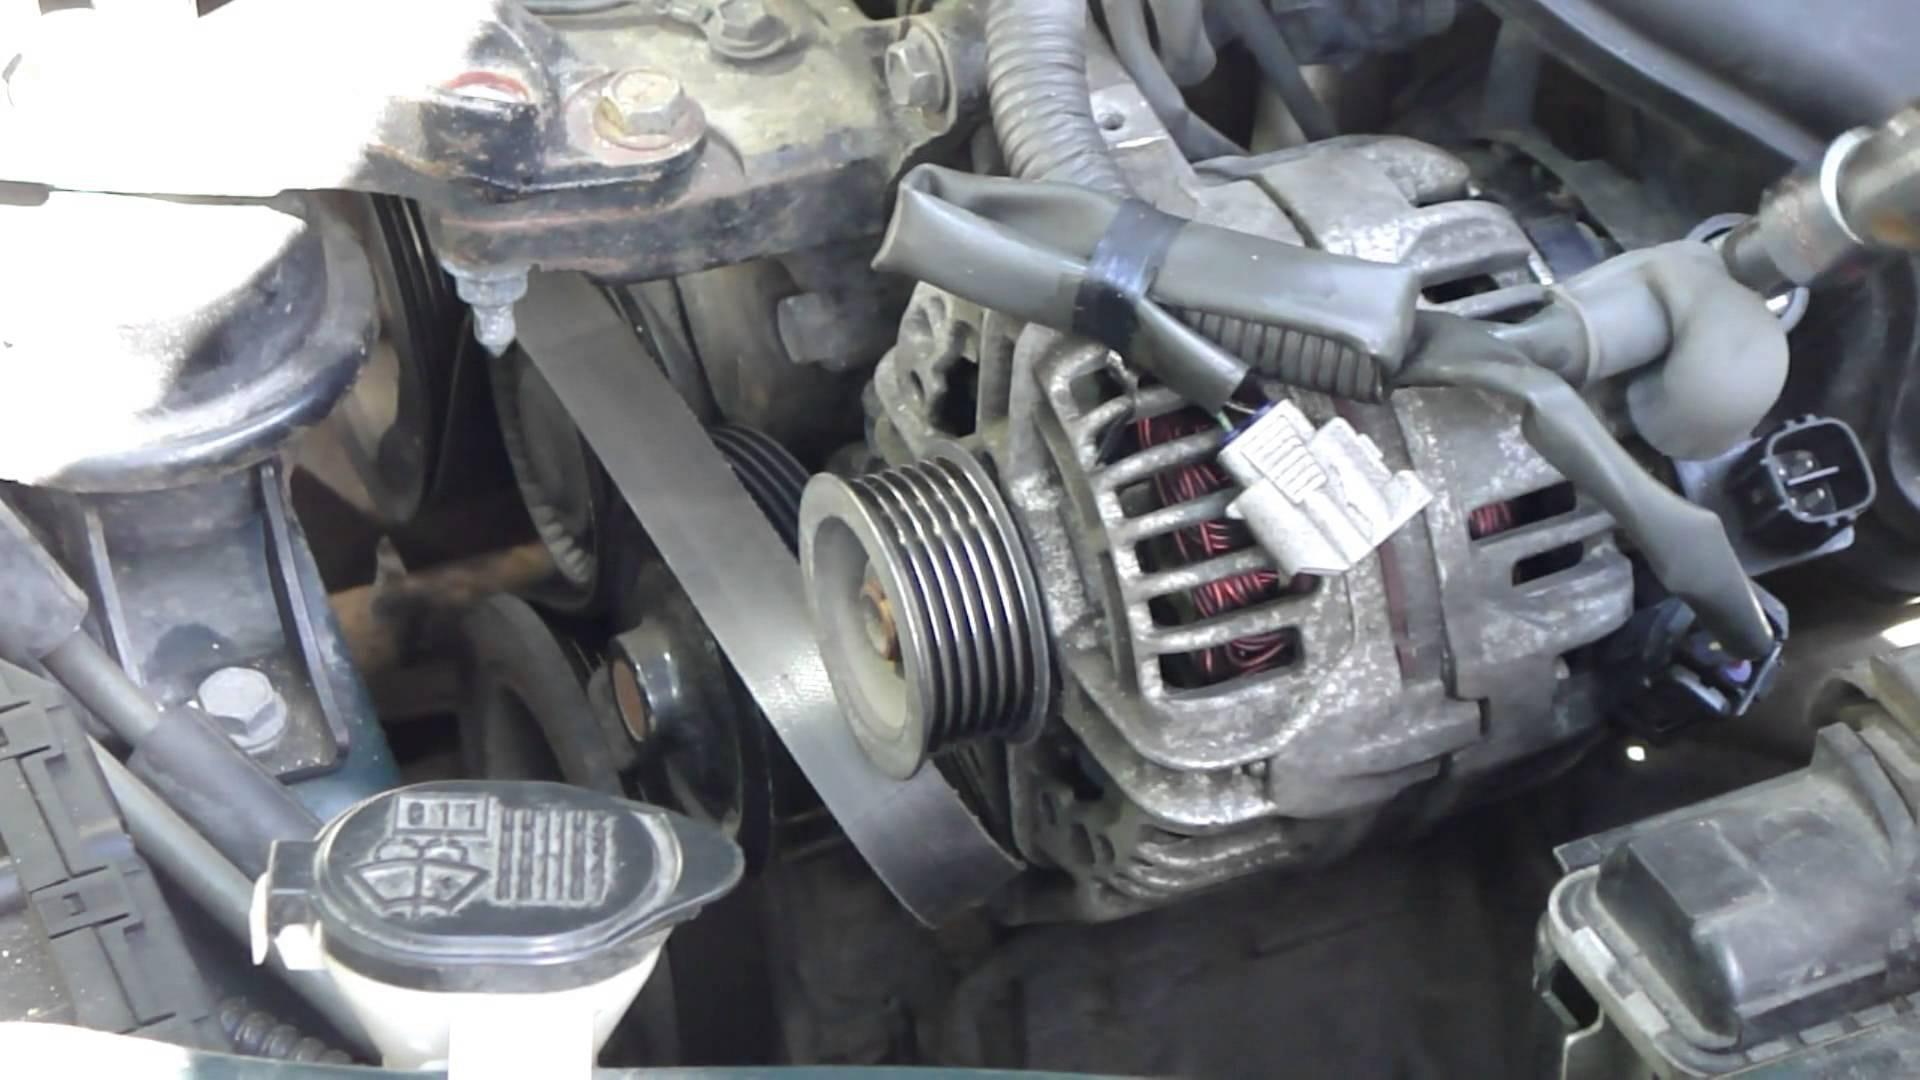 Toyota Matrix Engine Diagram How to Change Alternator toyota Corolla Vvt I Engine Years 2000 Of Toyota Matrix Engine Diagram